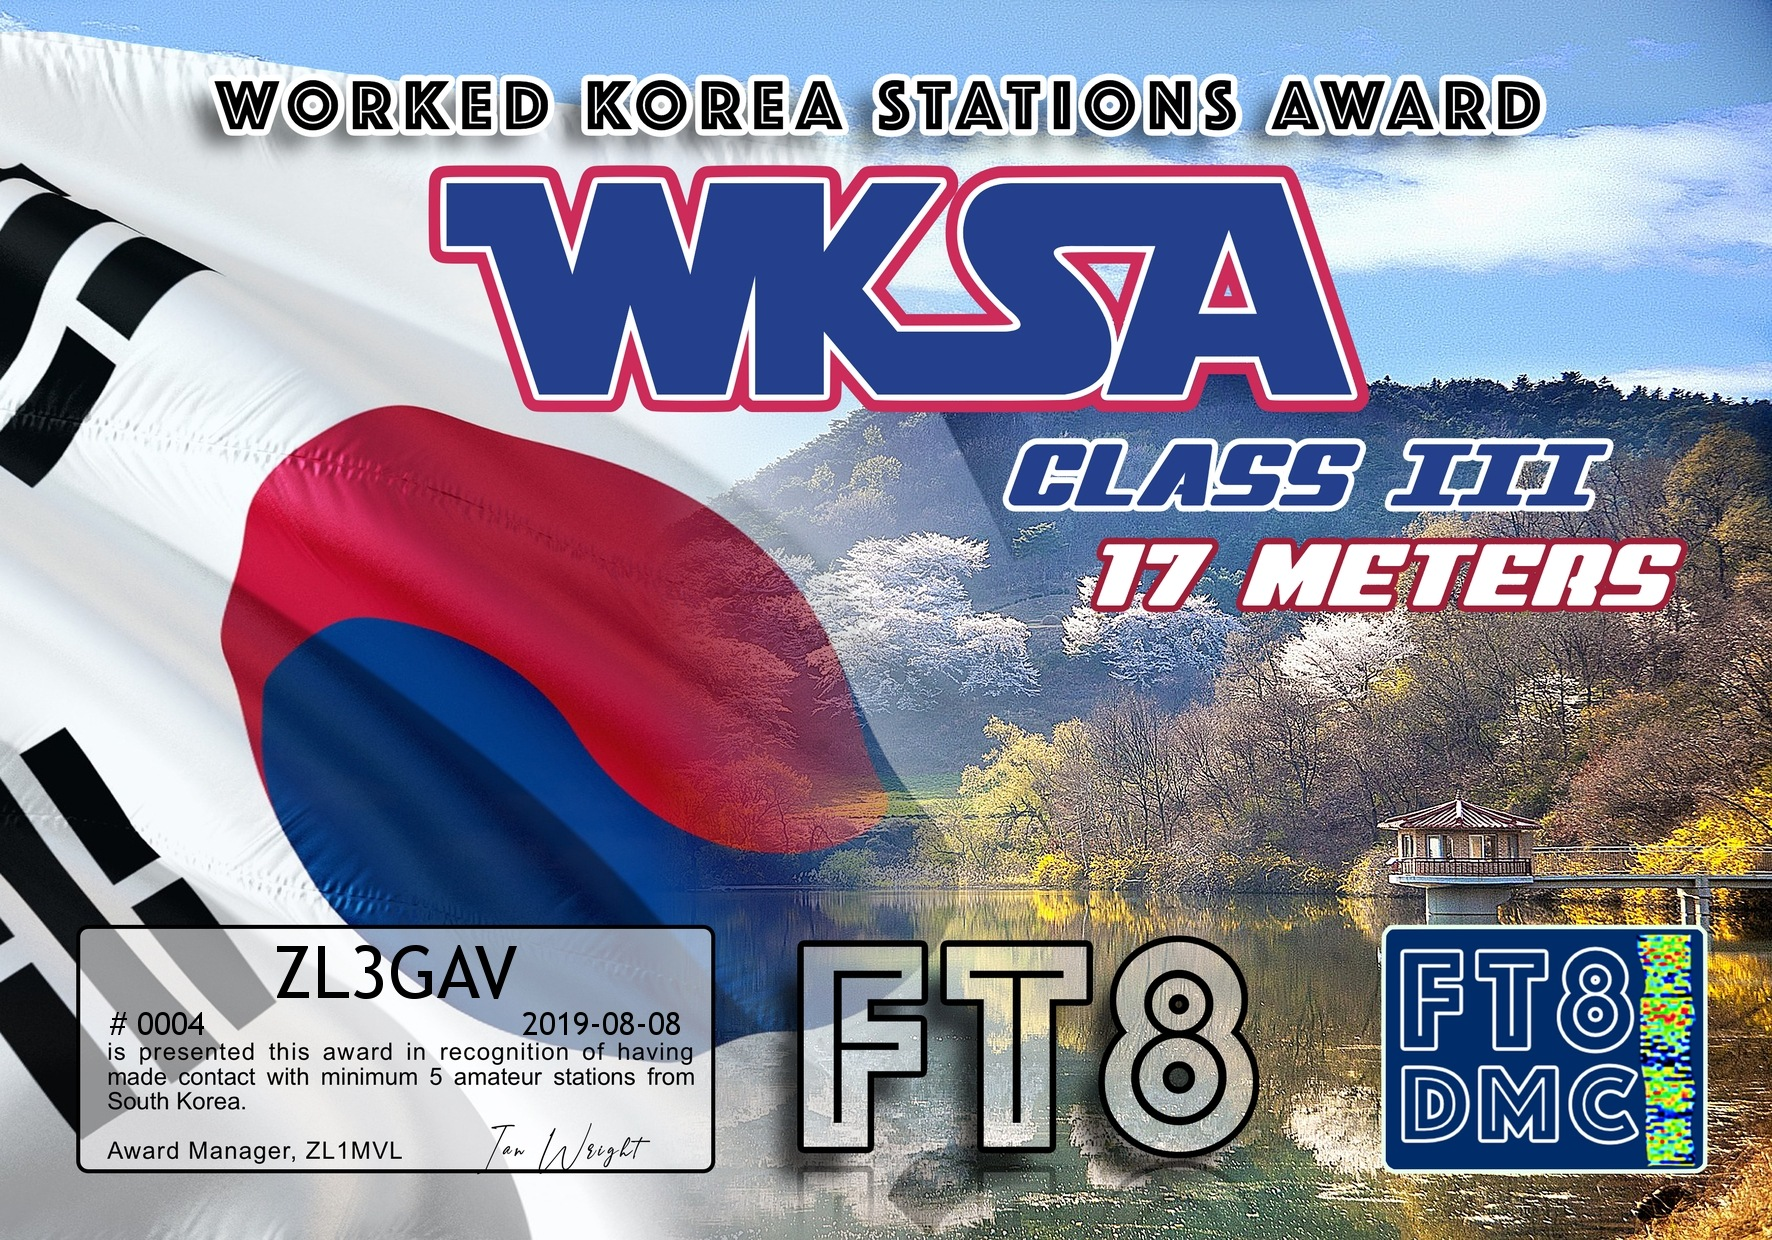 ZL3GAV-WKSA17-III.jpg